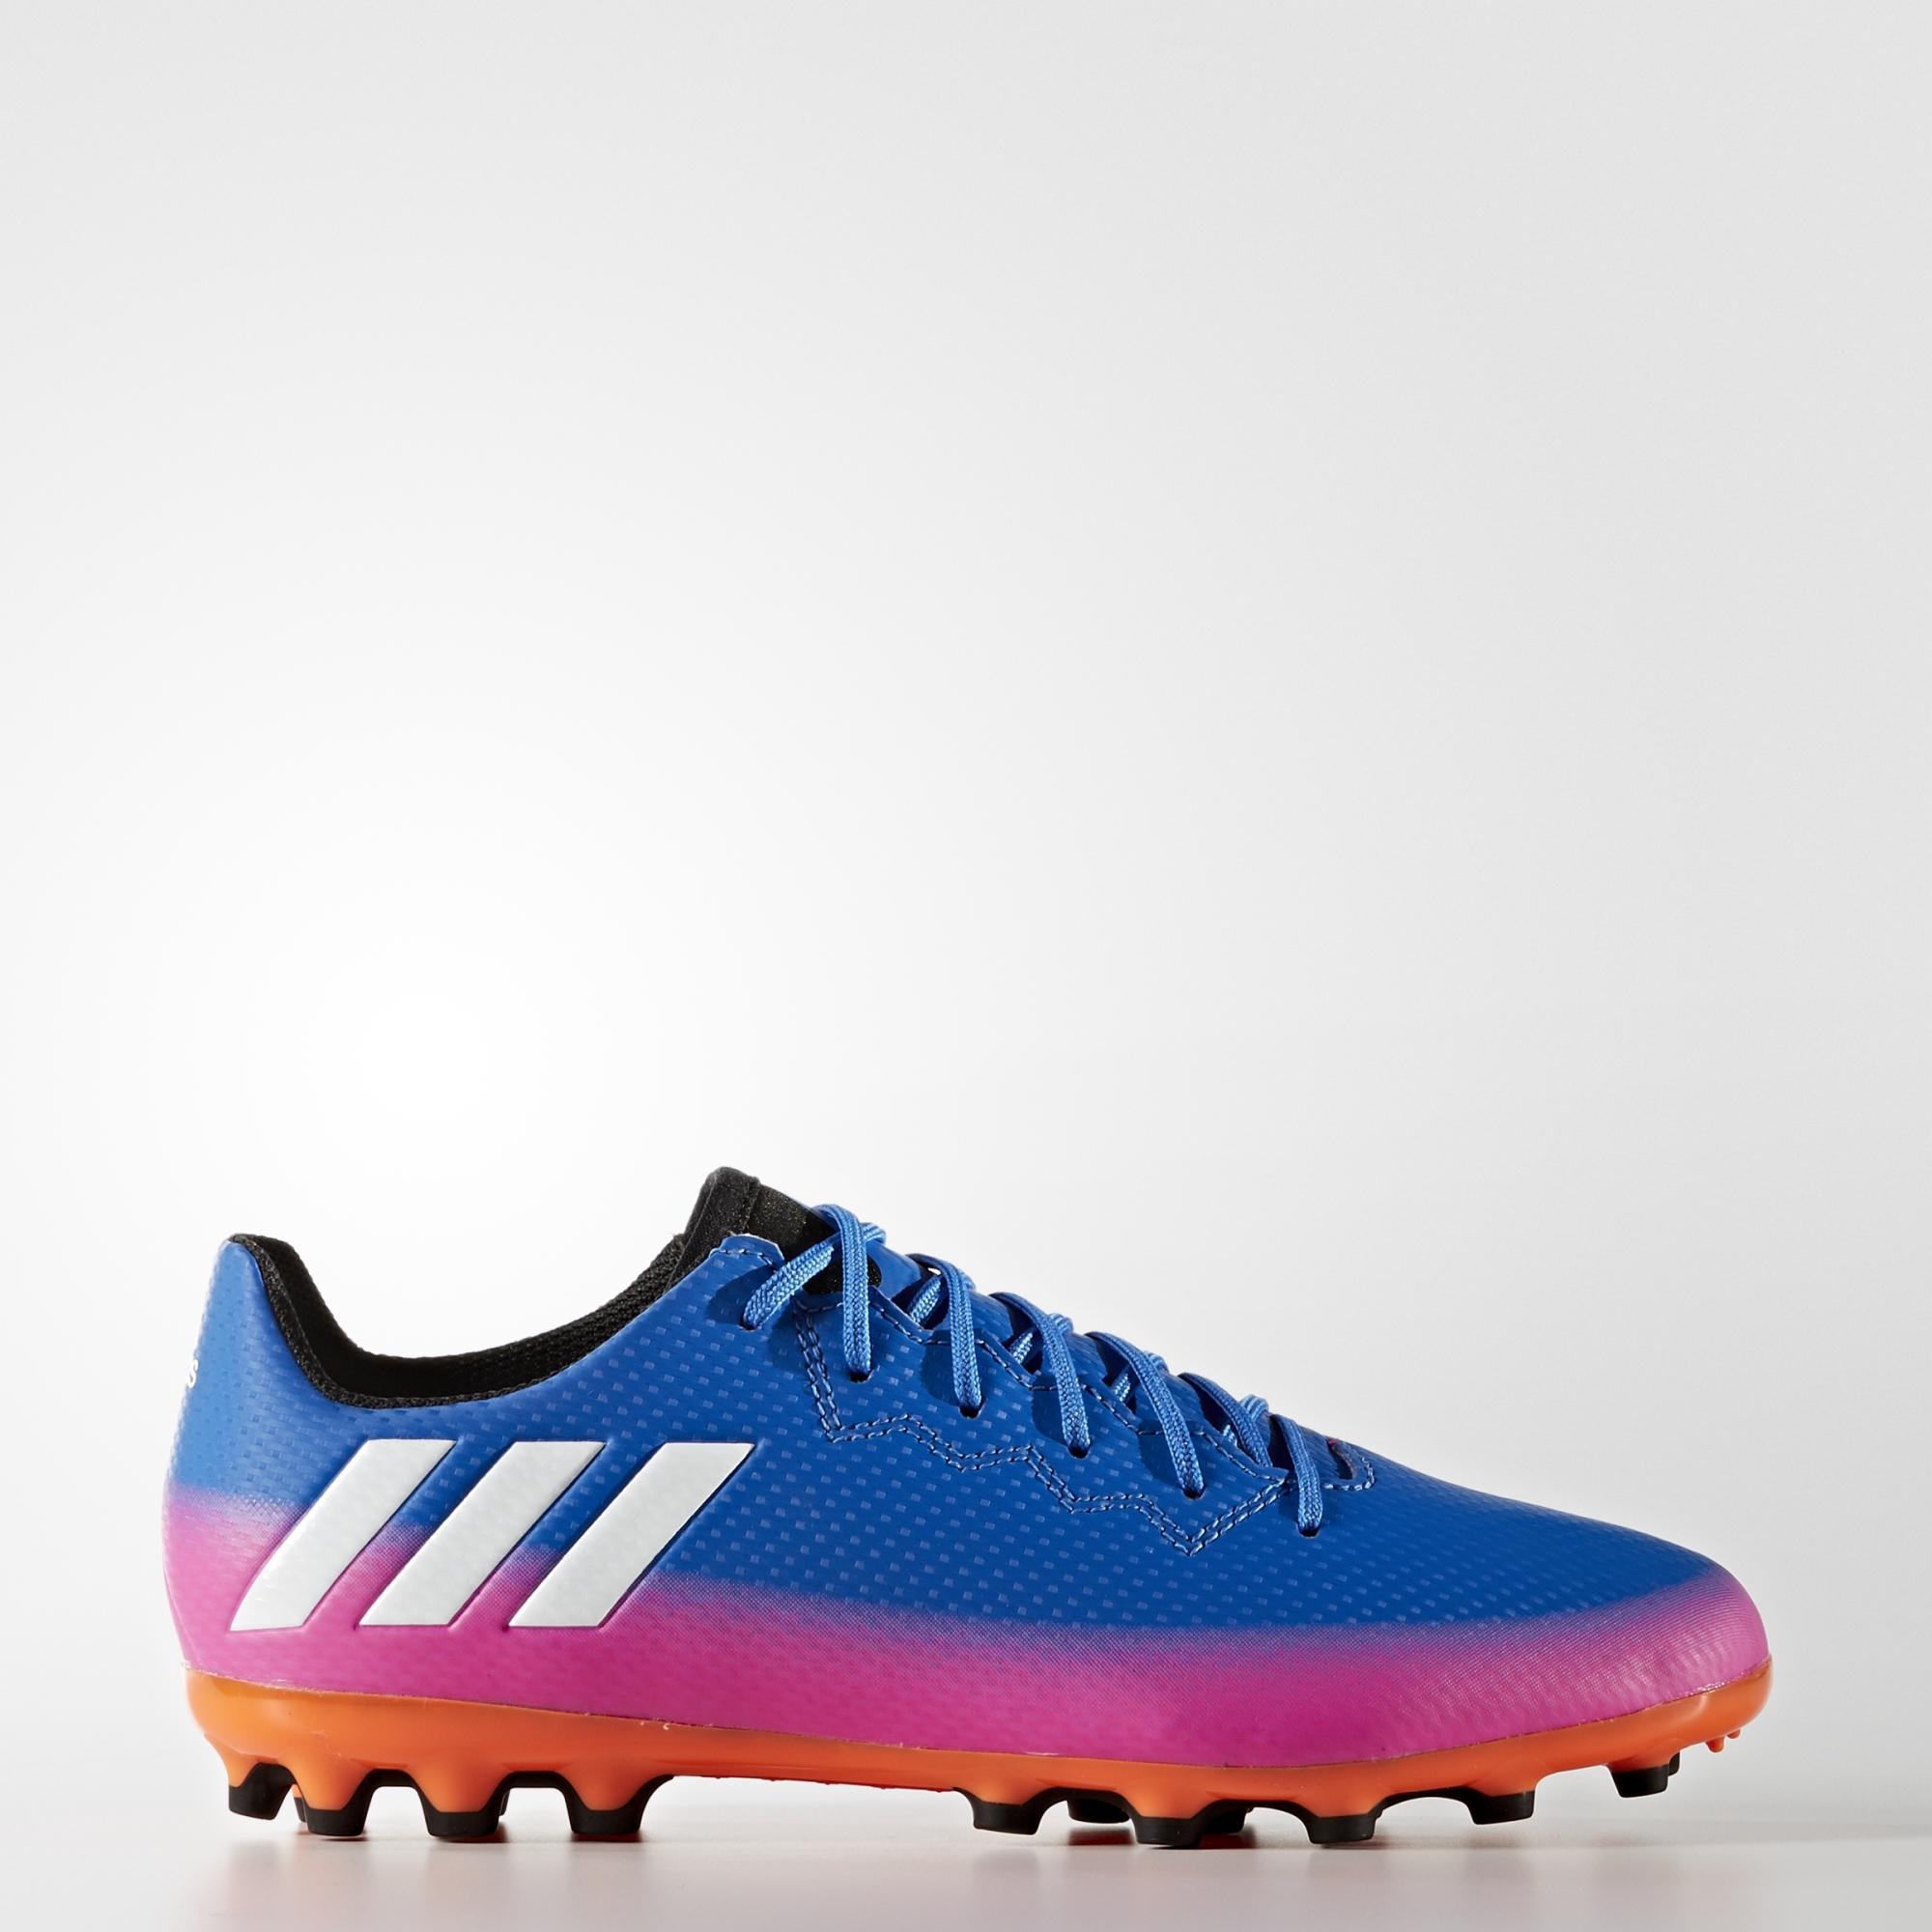 b42fffdb6c953 Adidas Messi 16.3 AG J S80762 Gyerek Foci Cipő